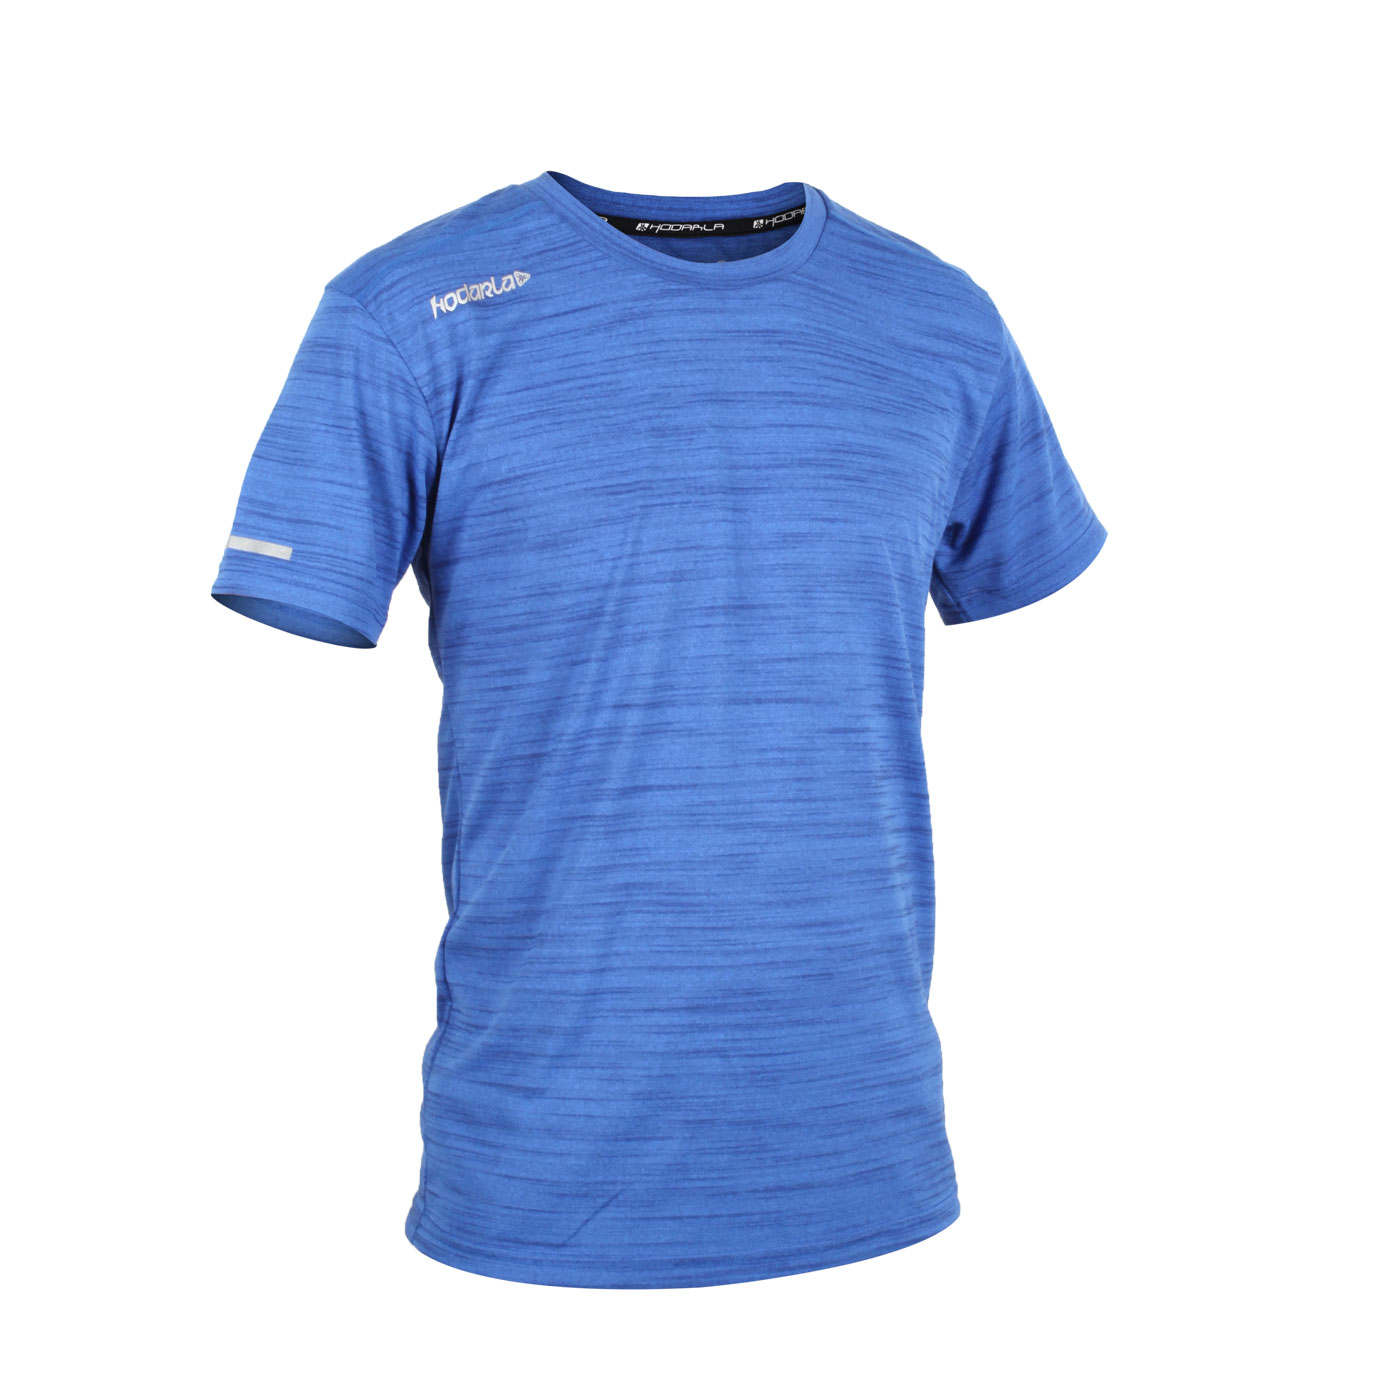 HODARLA 男-攀越針織短袖T恤 3147302 - 麻花藍